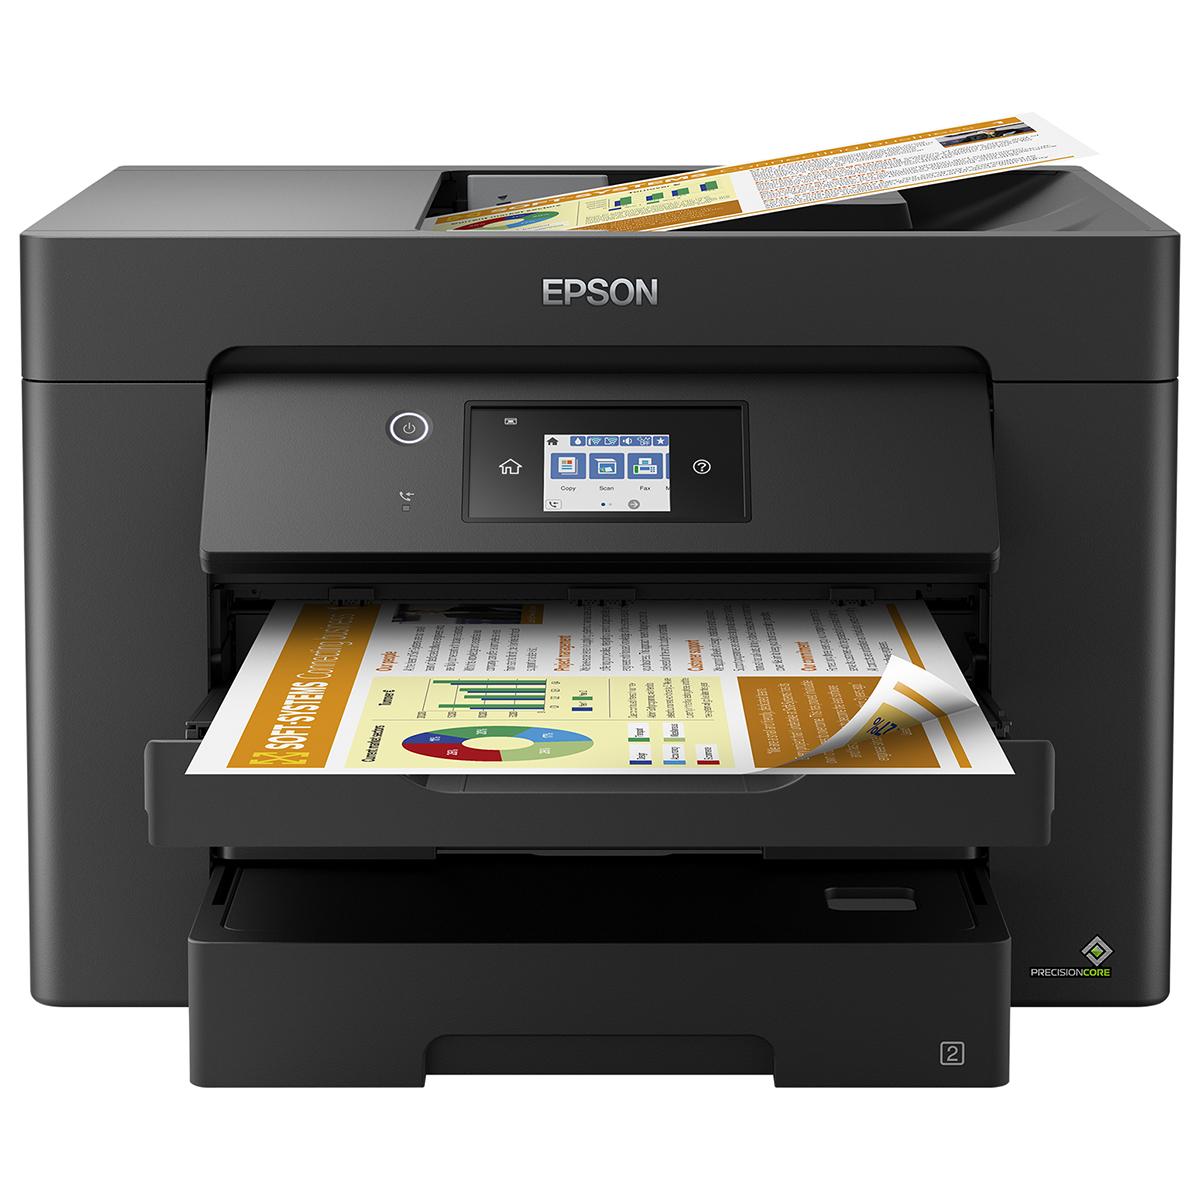 Epson WorkForce WF-7830DTWF A3 Colour Inkjet Multifunction